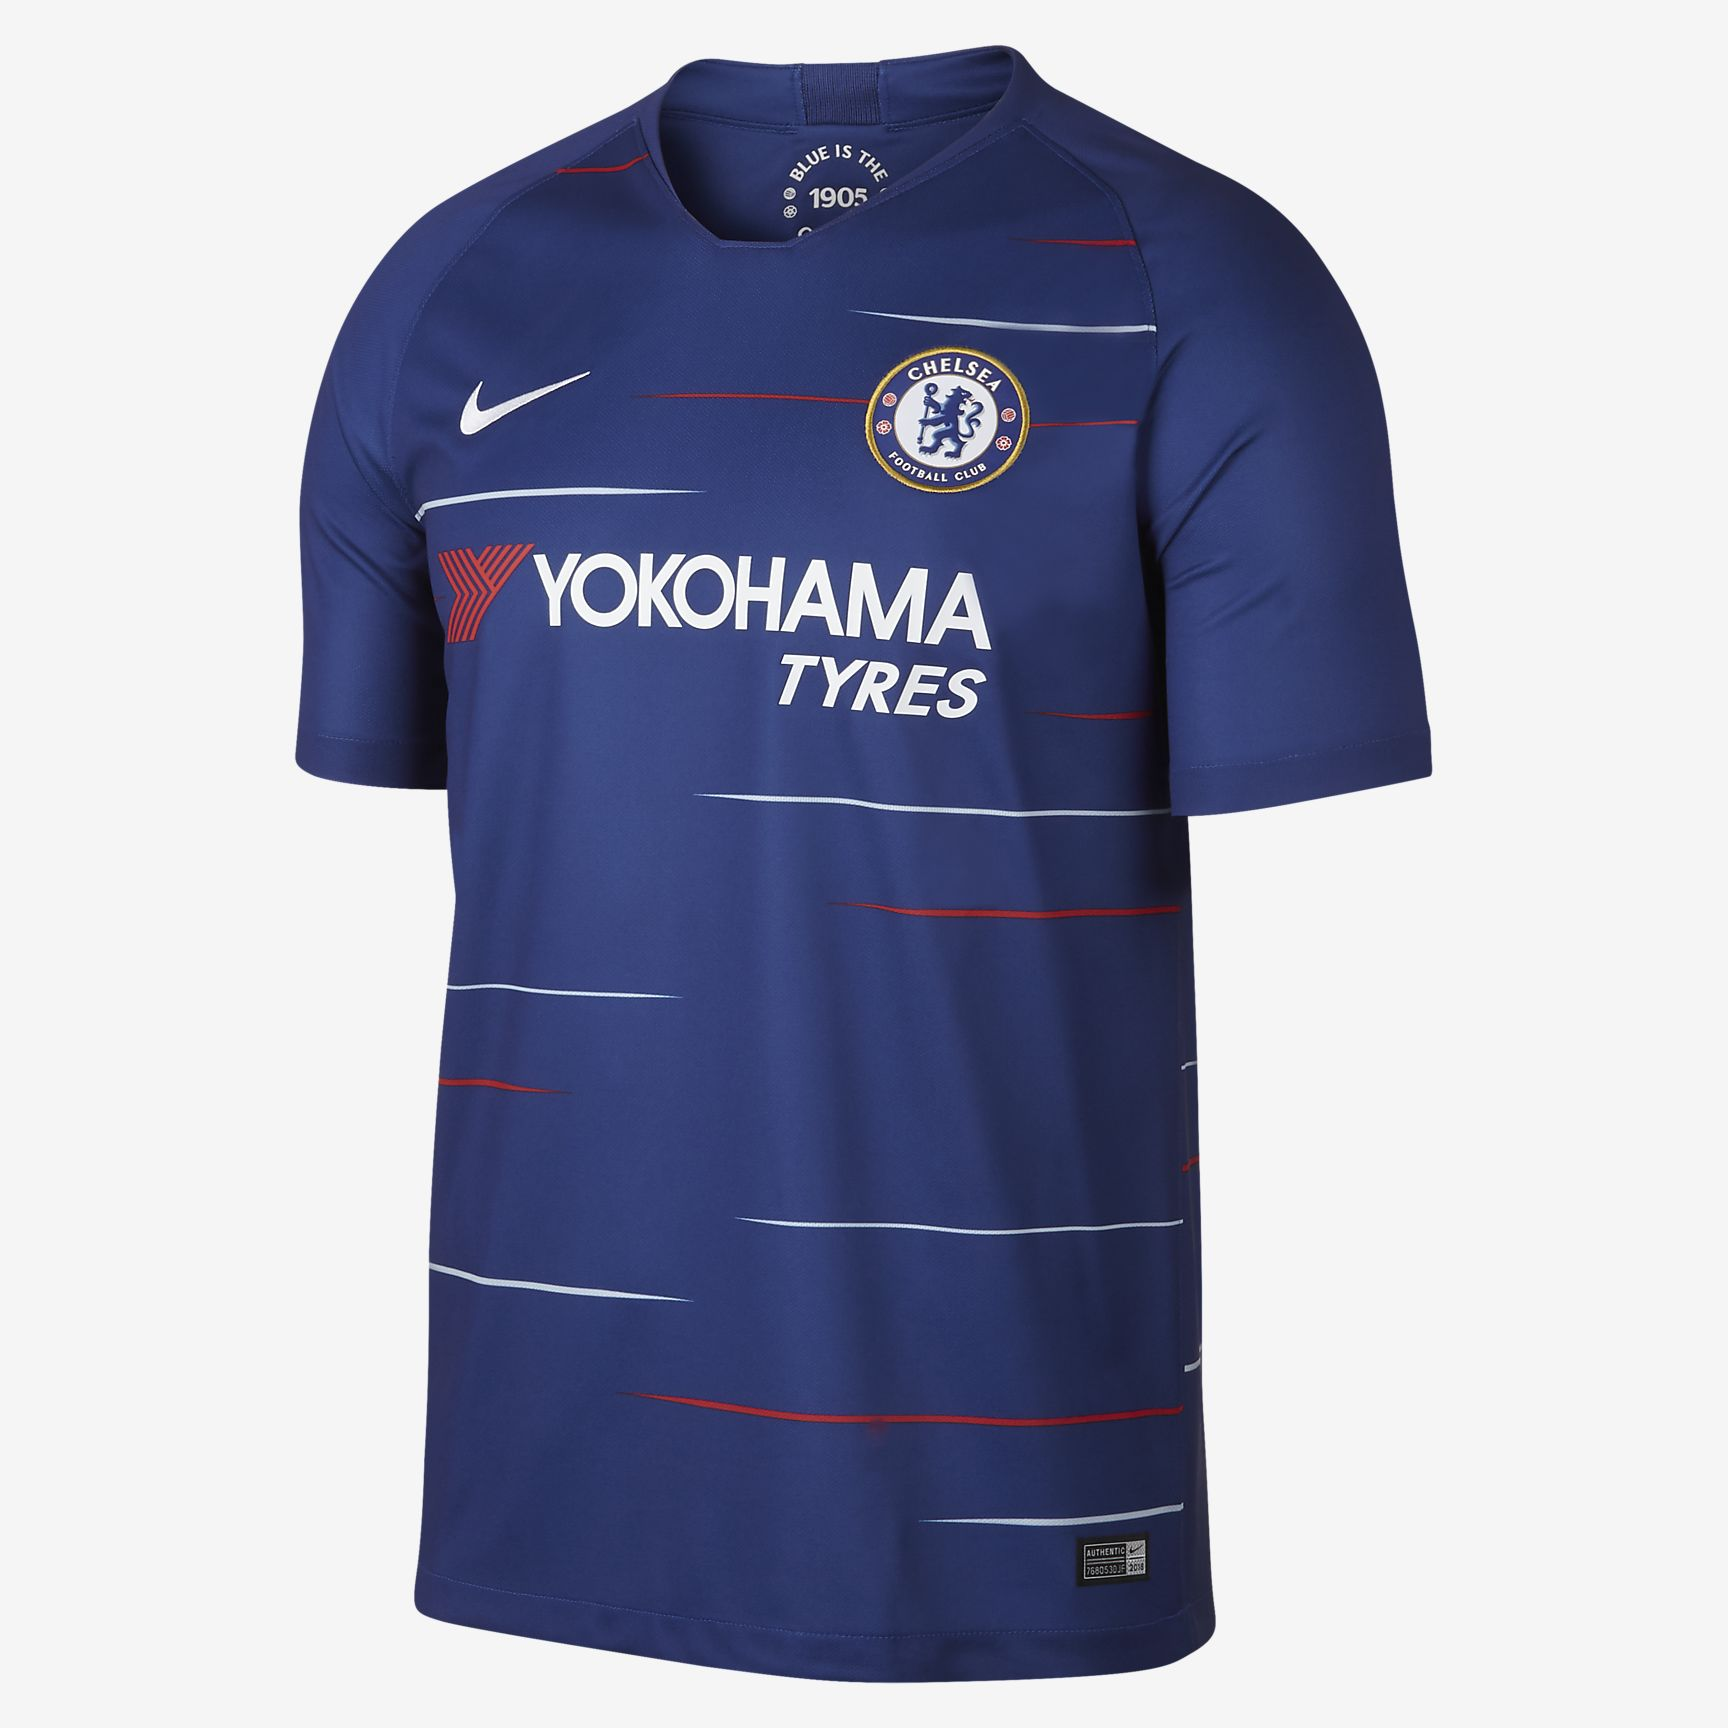 f8d35950c24 Nike FC Chelsea 2018-19 Stadium Soccer Home Jersey - Soccer Shop London  Chelsea Merchandise - Superfanas.lt